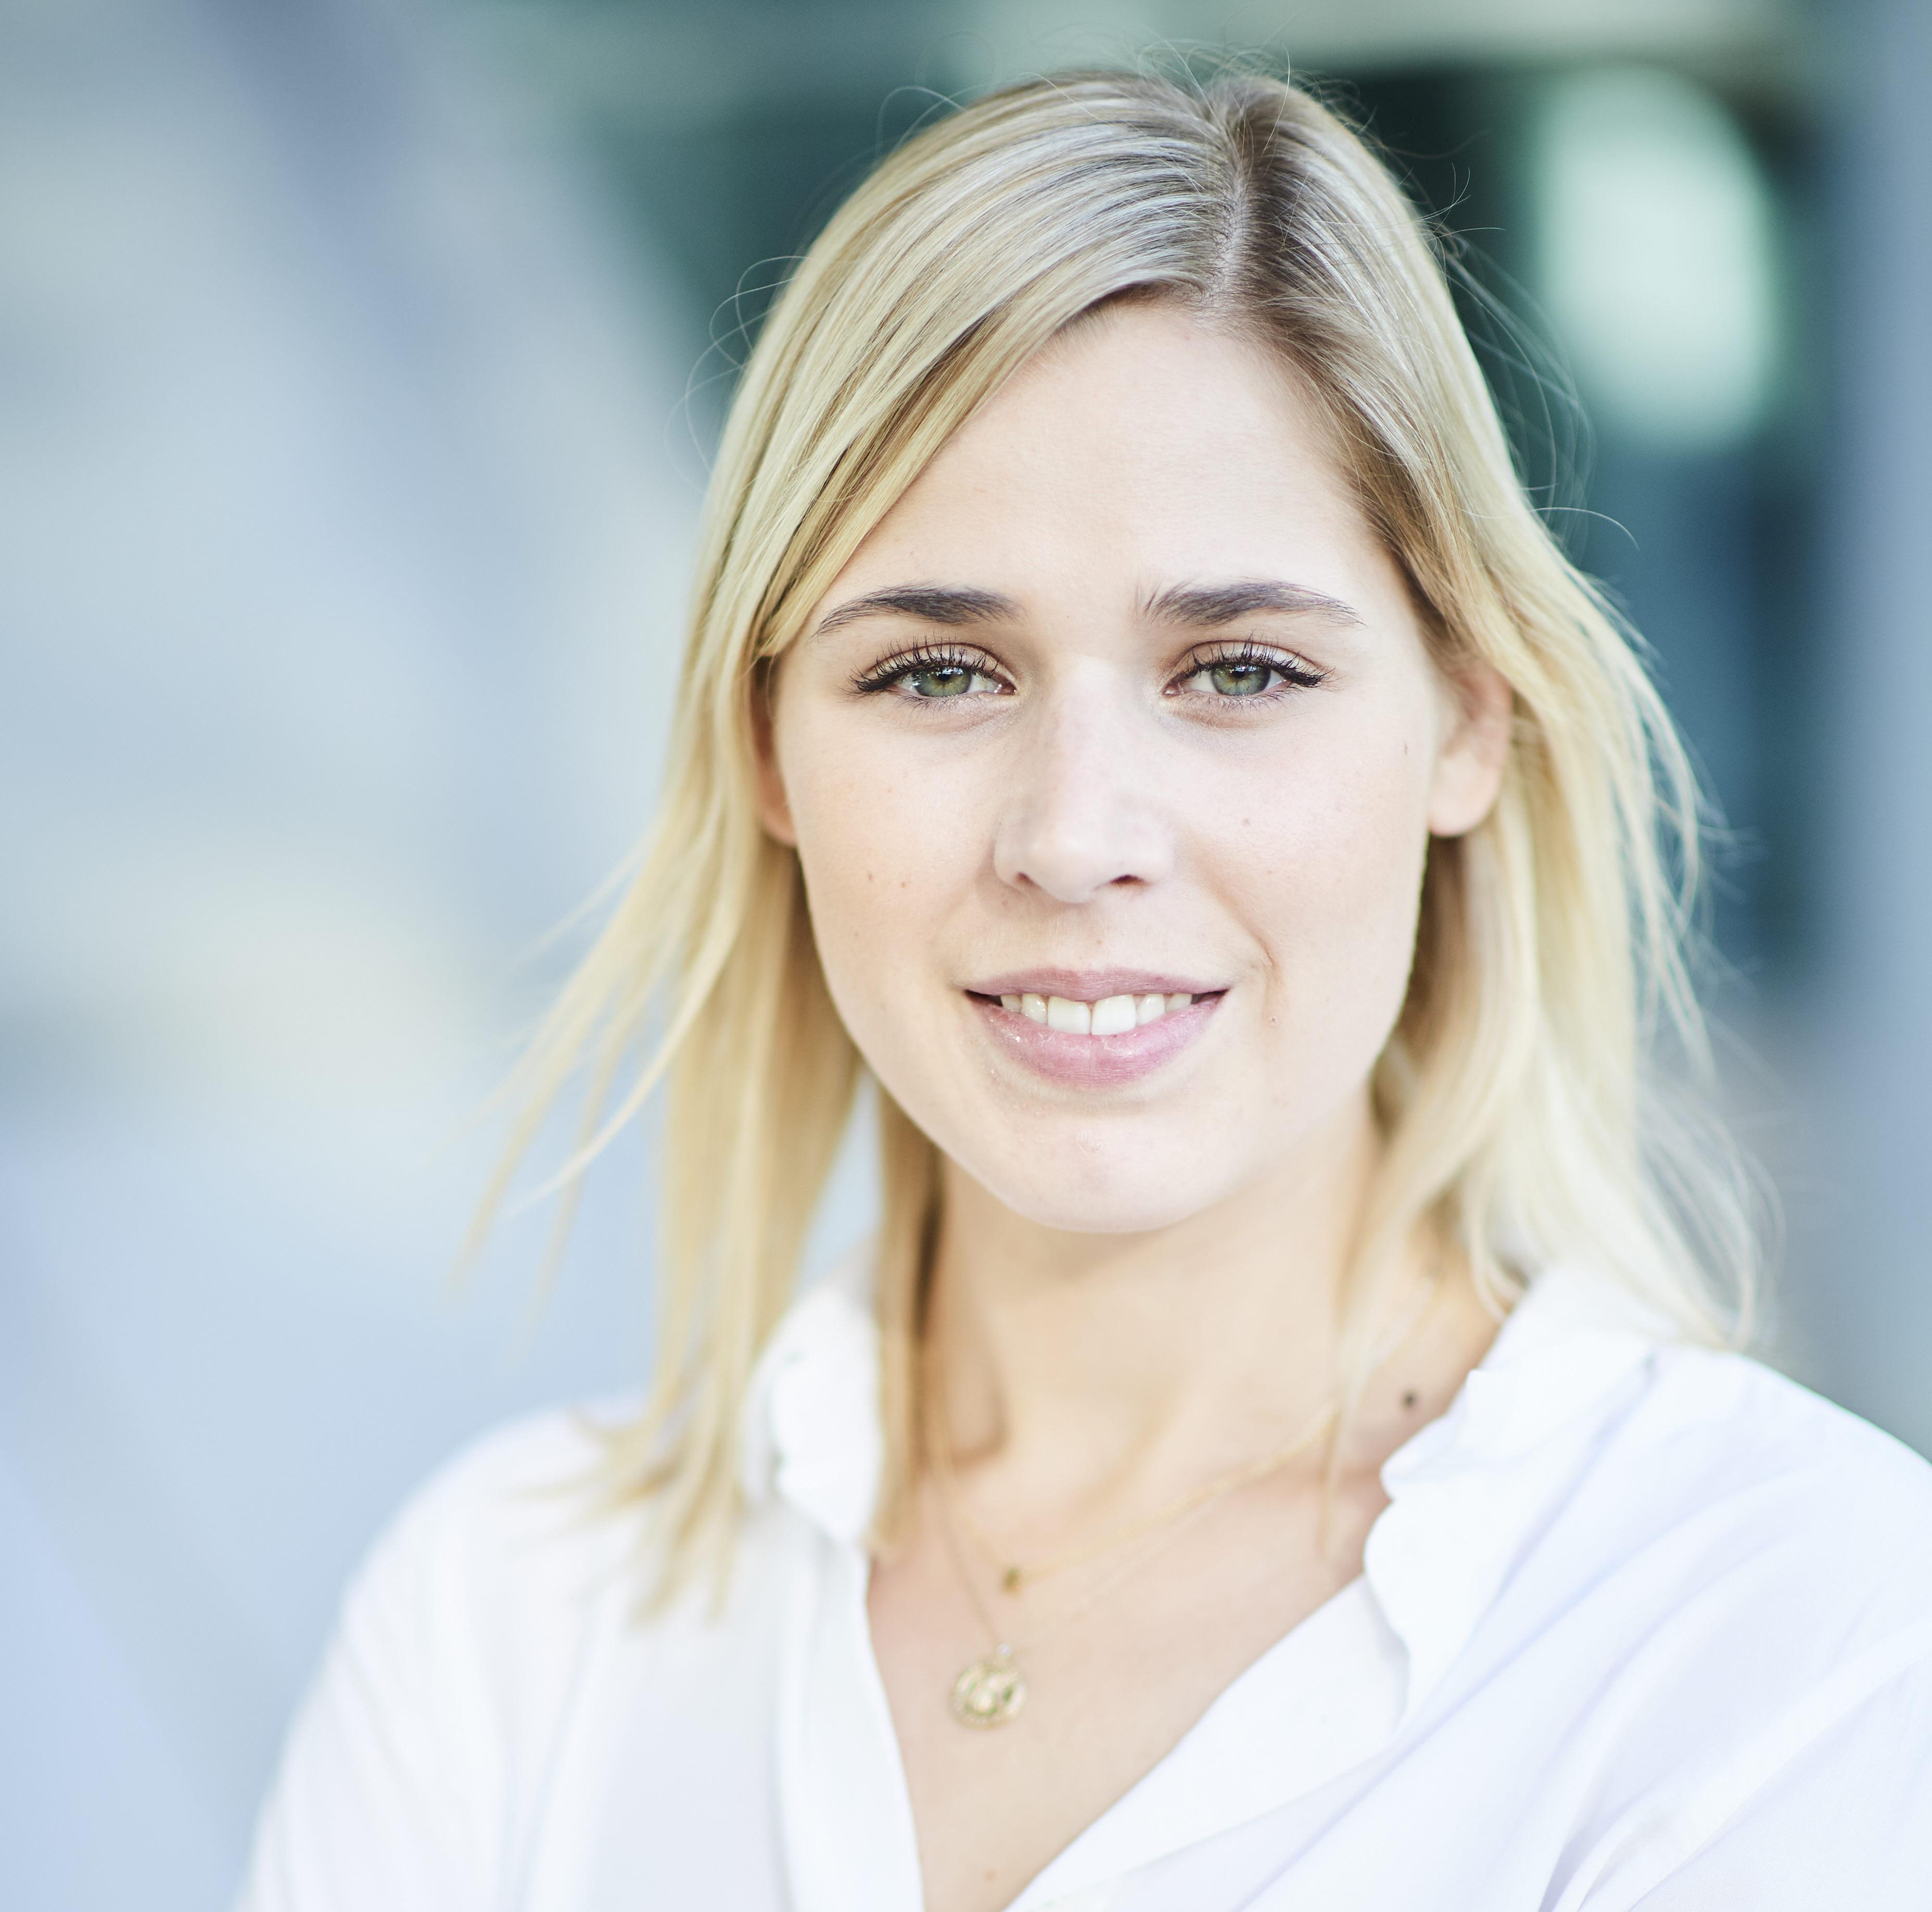 Elise Carton